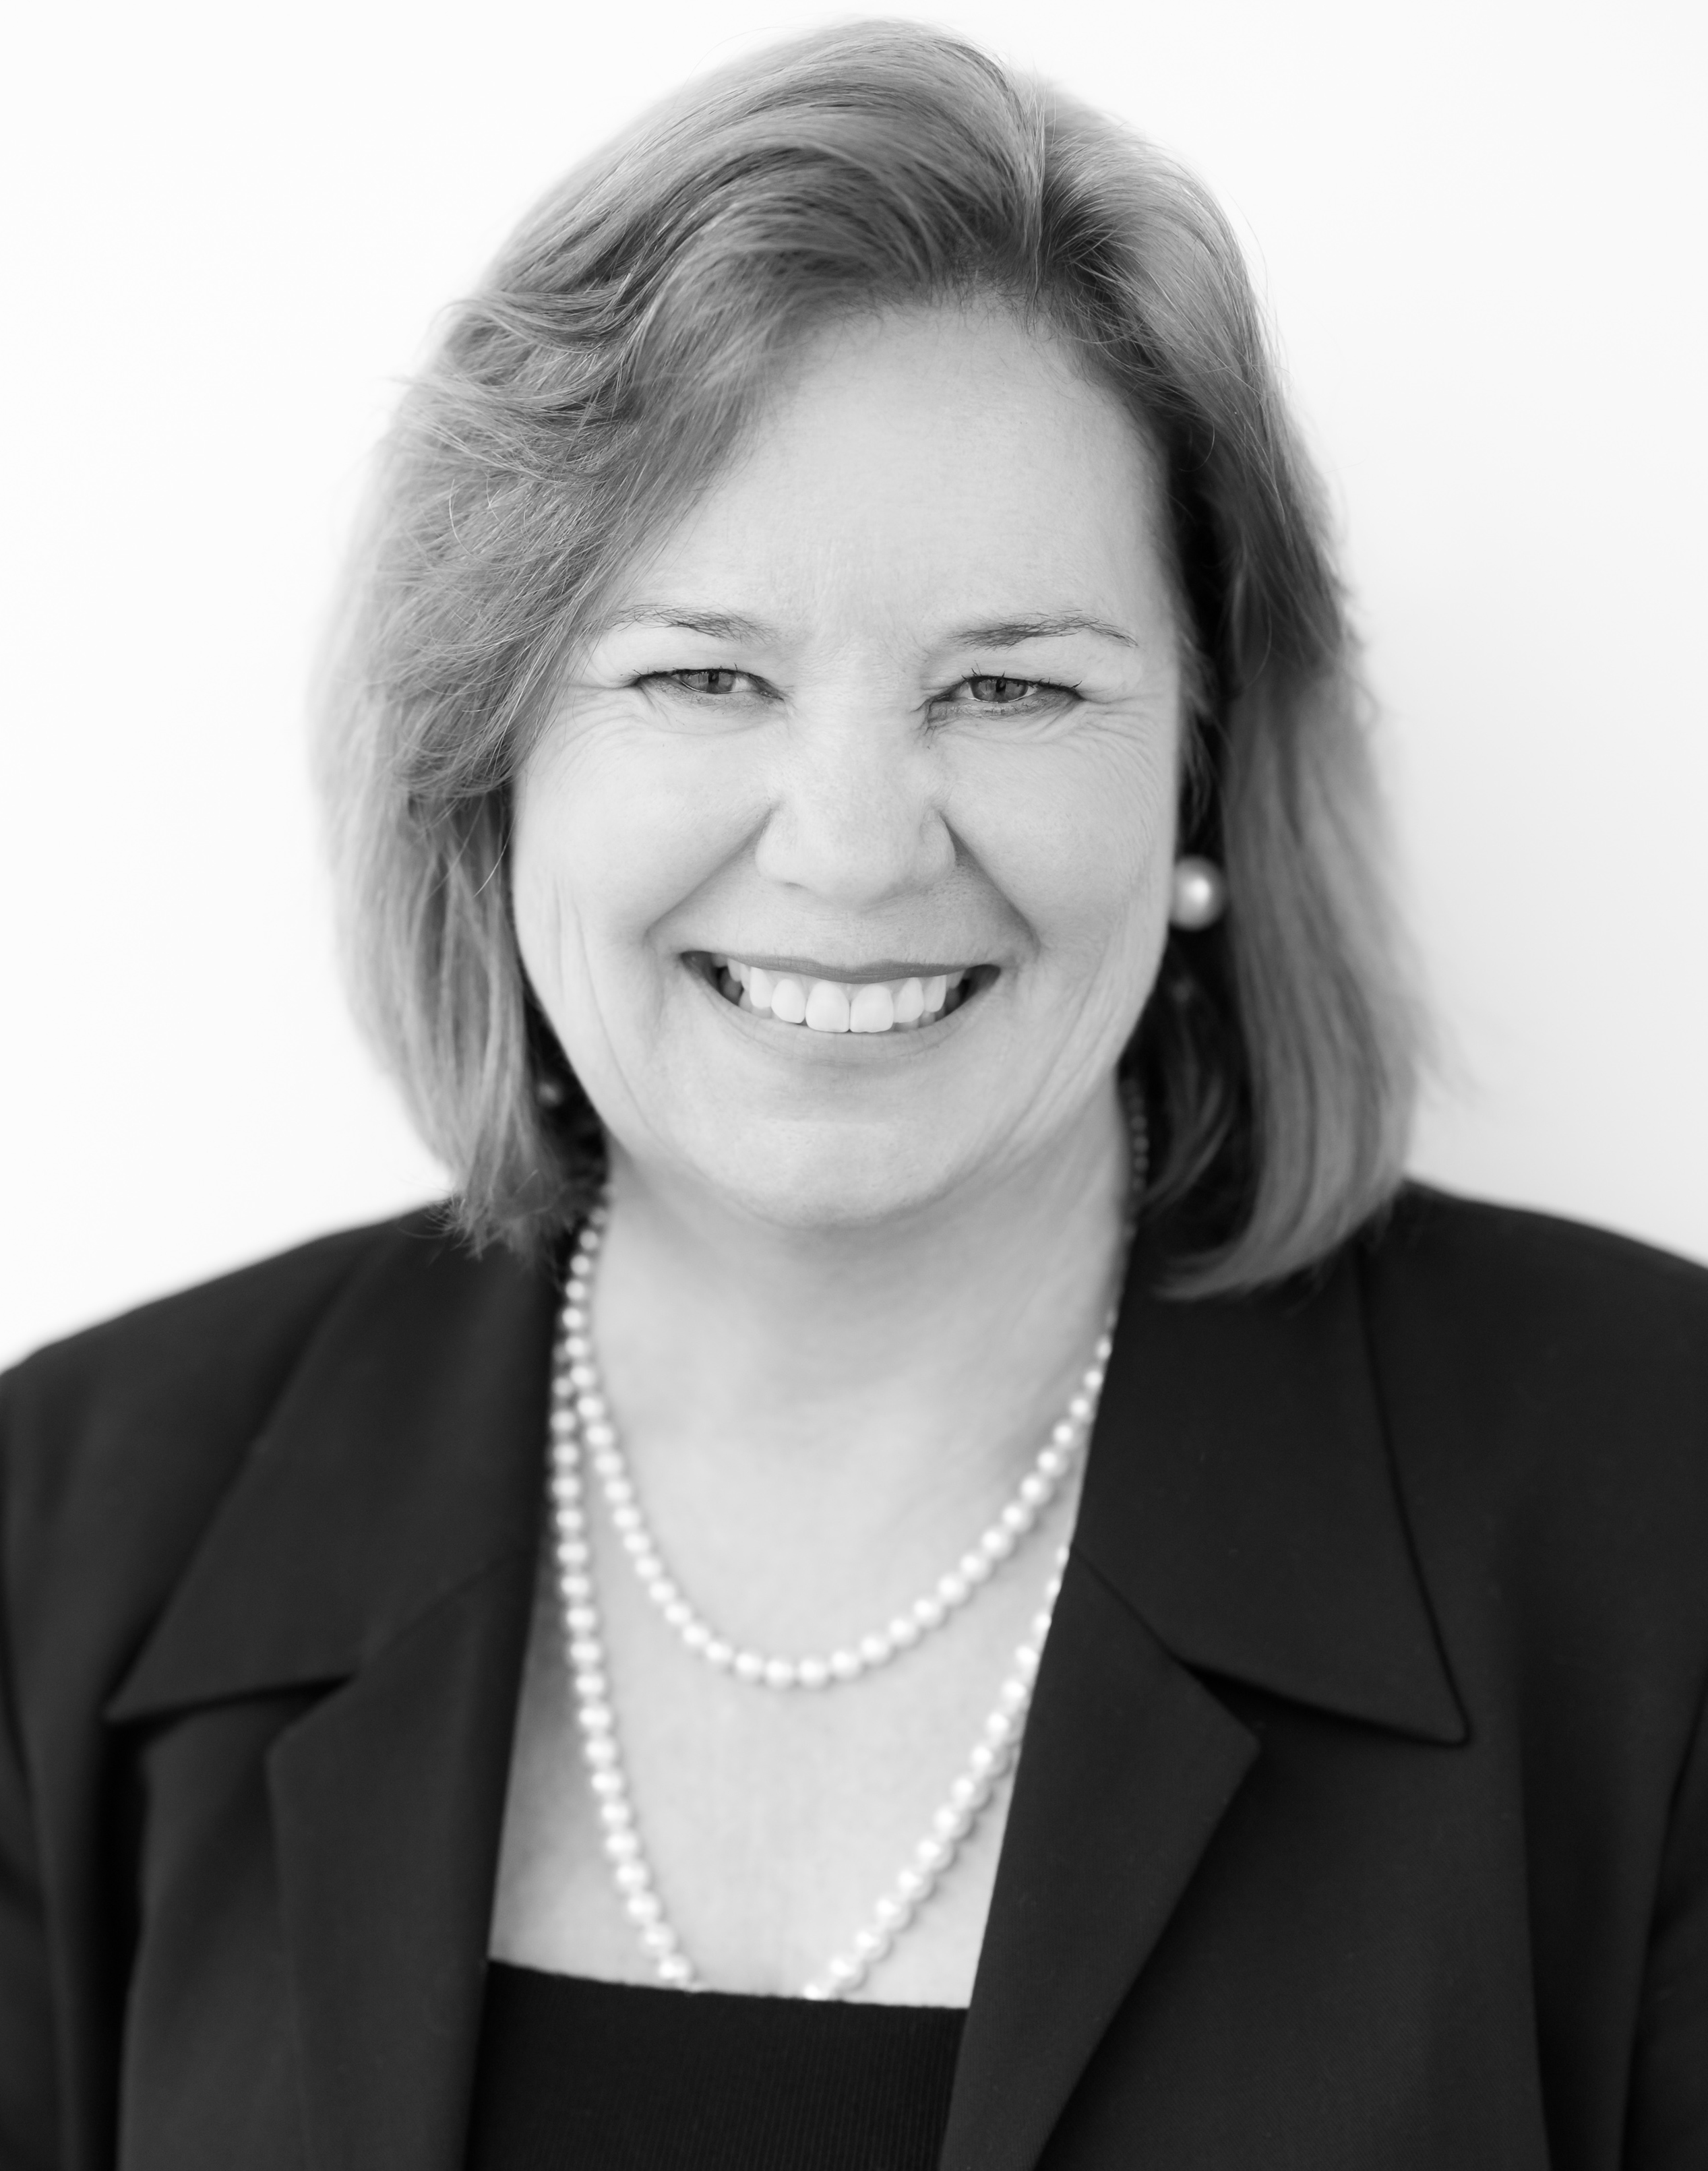 Kathryn Pisciotta